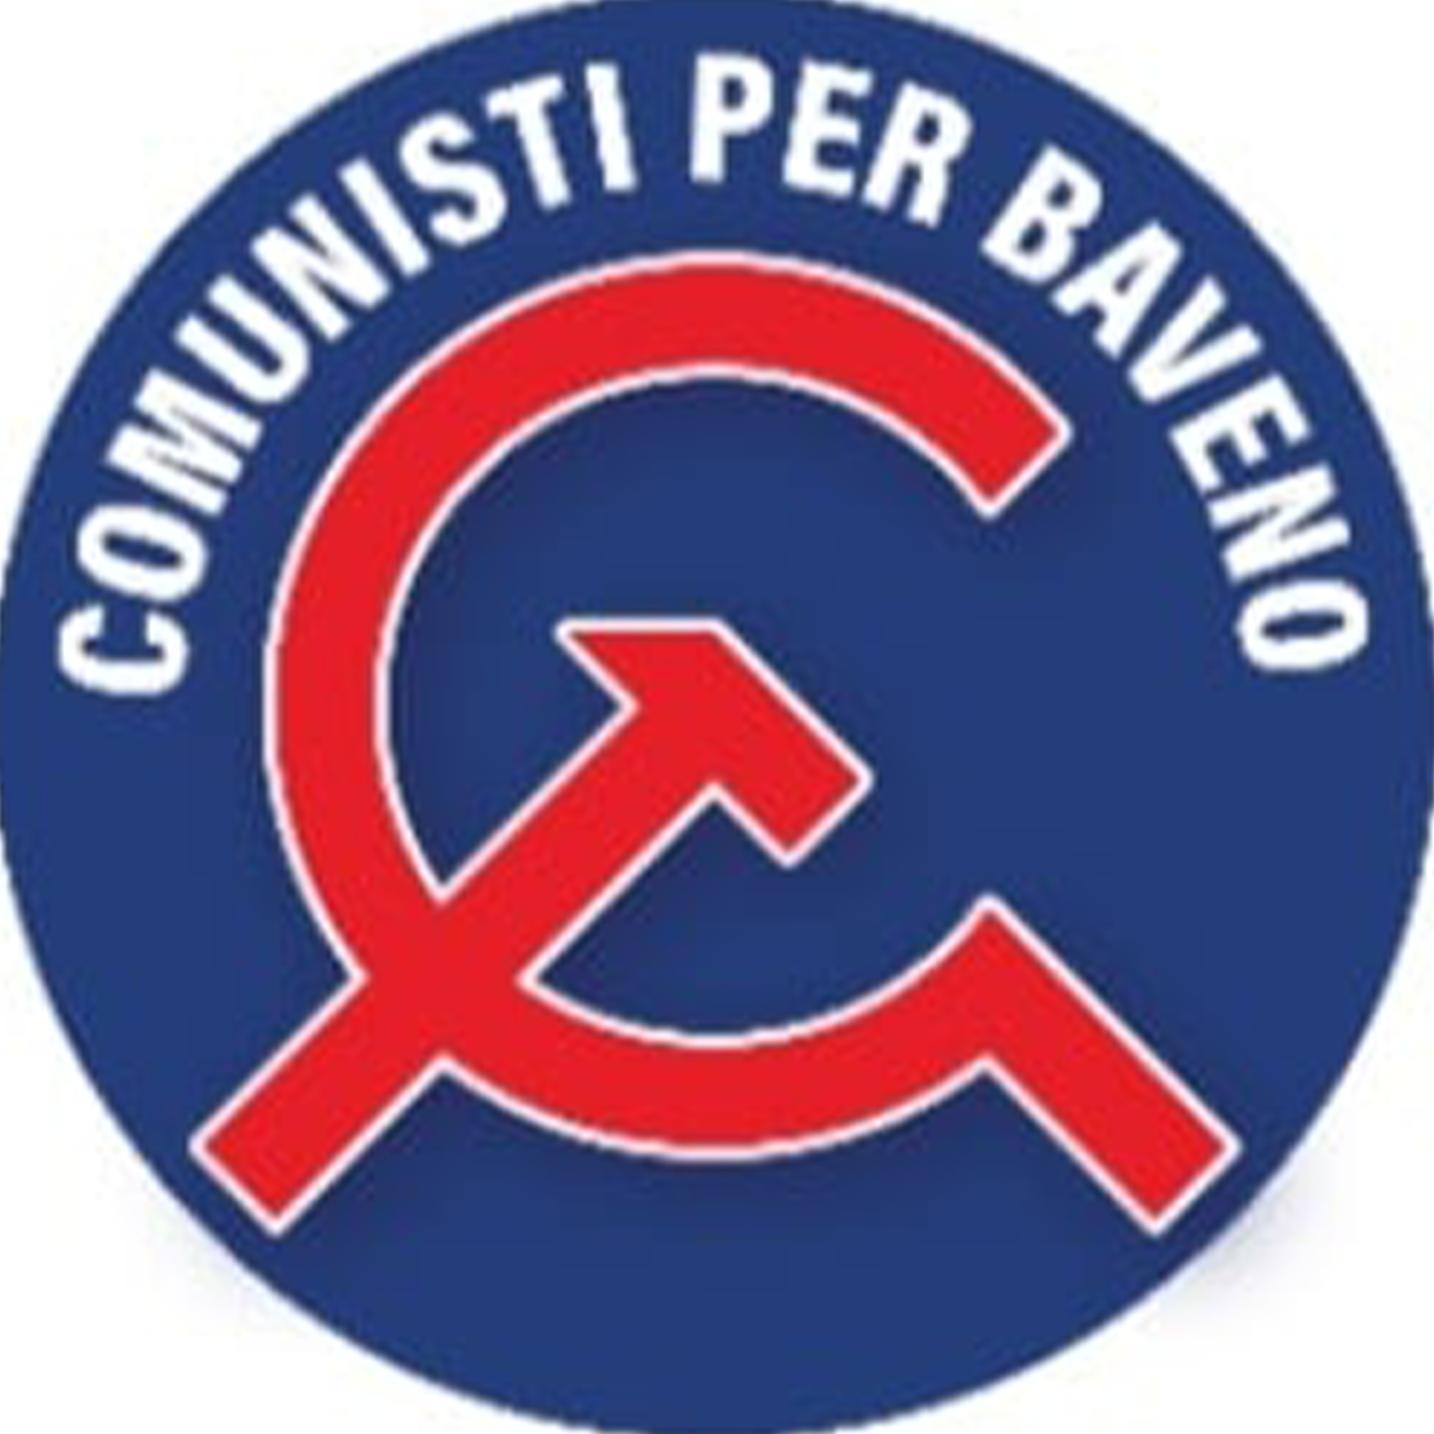 Comunisti per Baveno